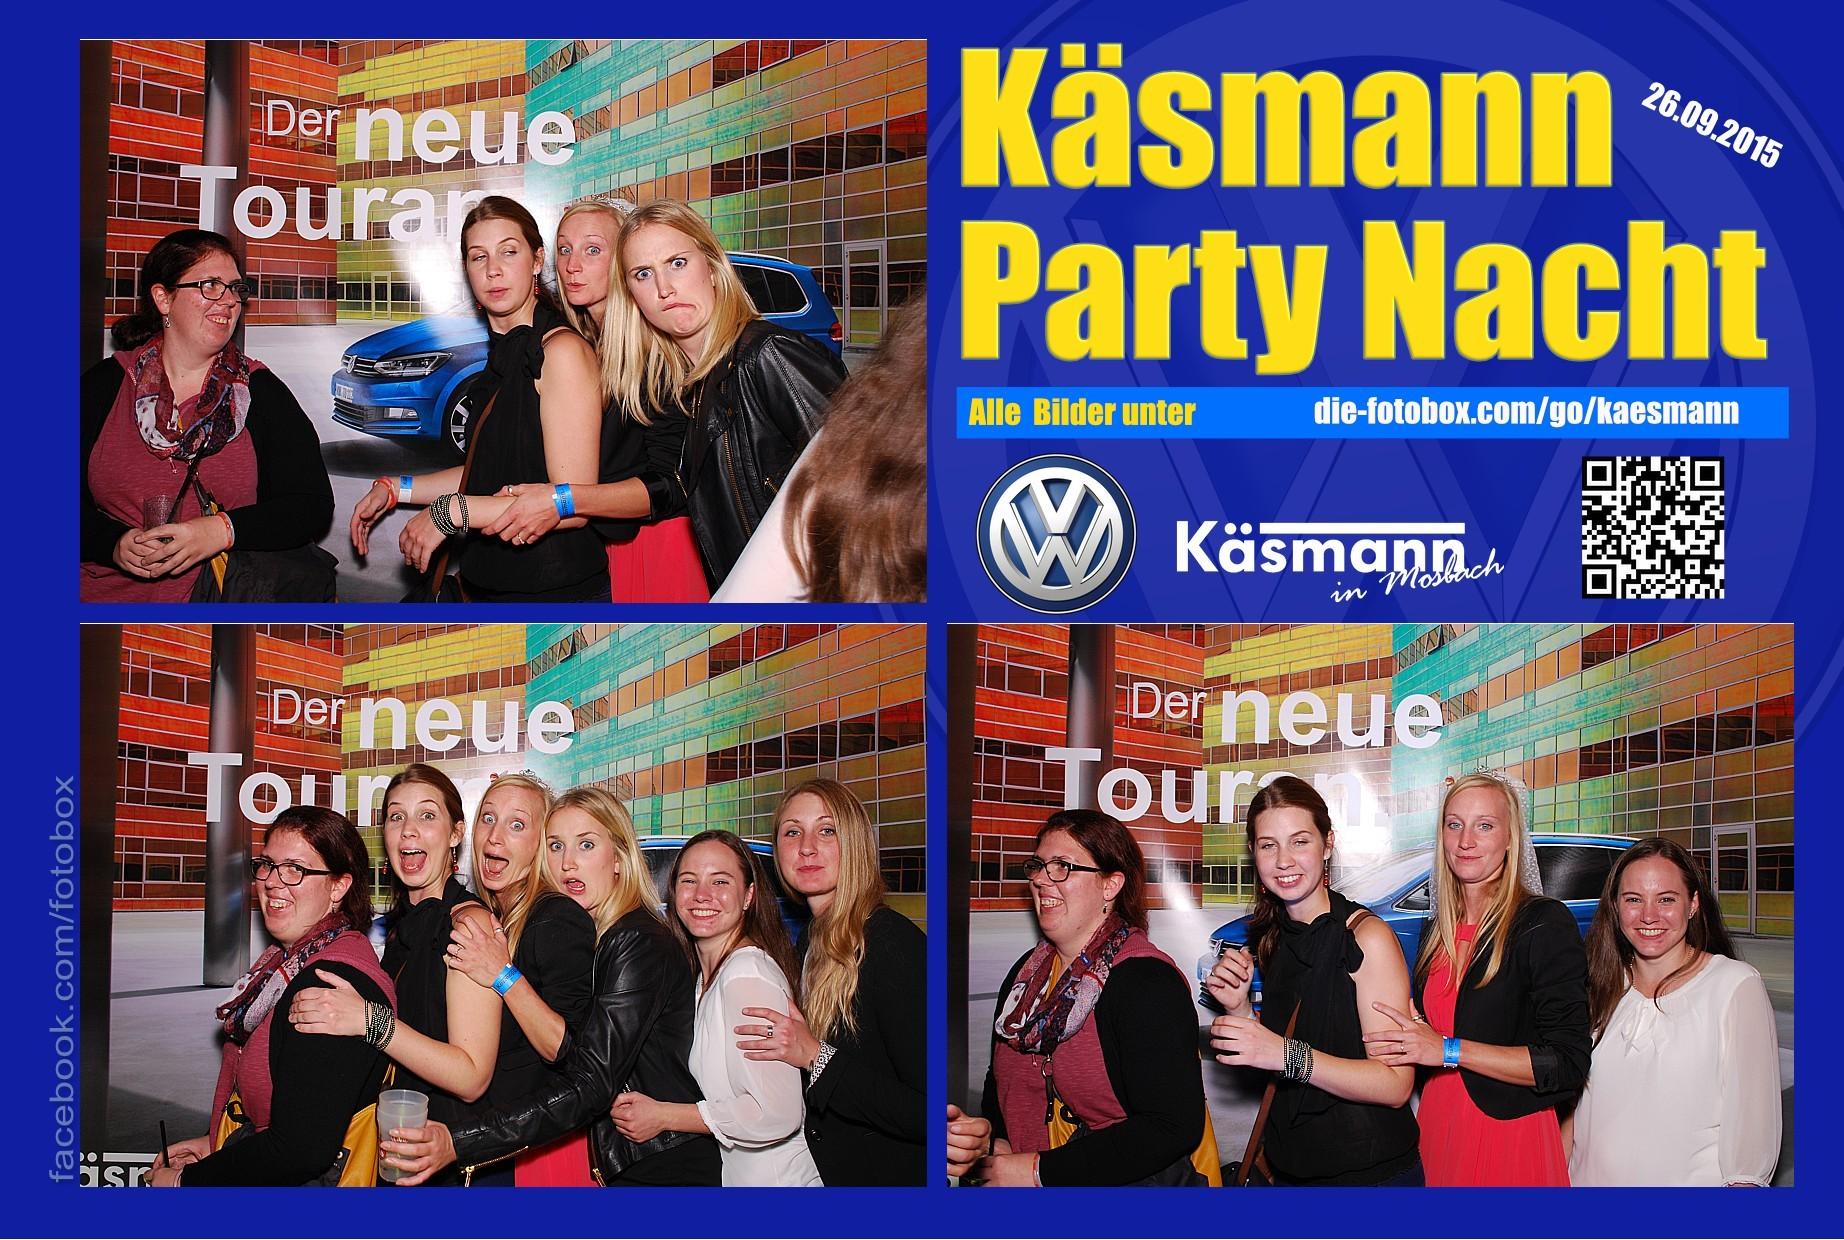 Käsmannparty 2015 - www.die-fotobox.com 01028